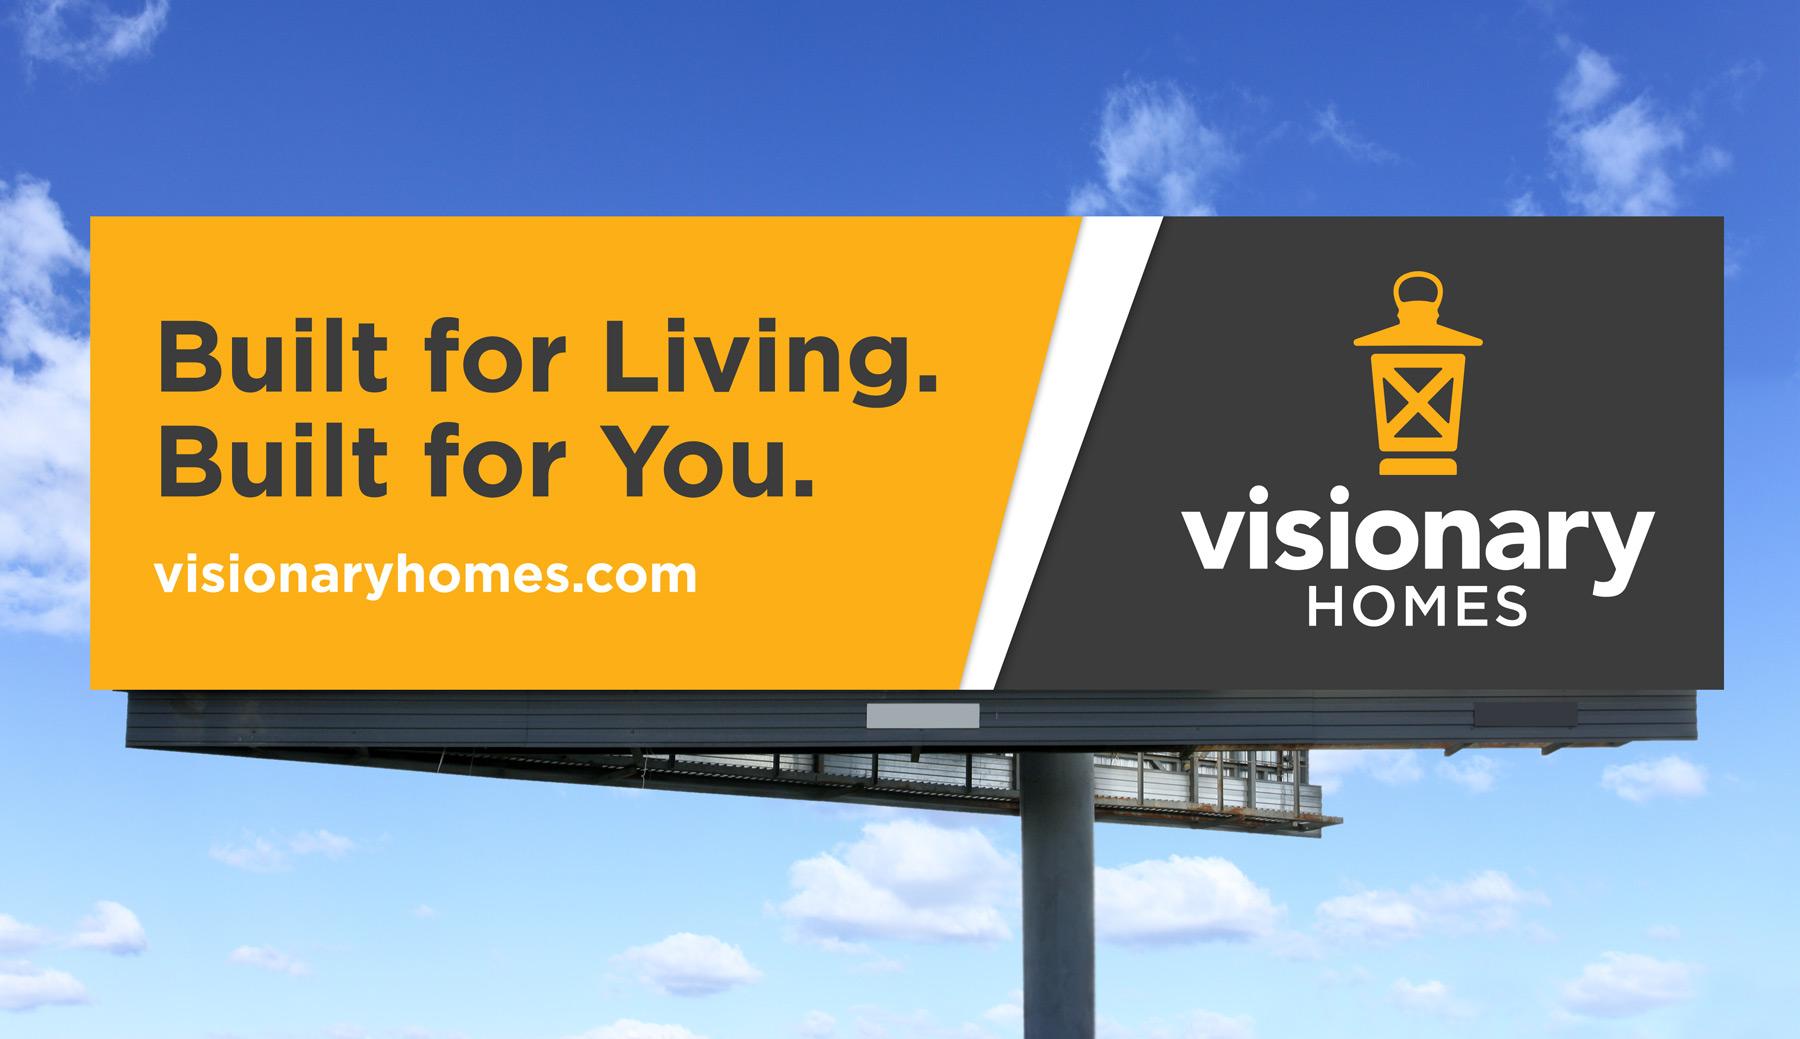 Visionary Homes Billboard